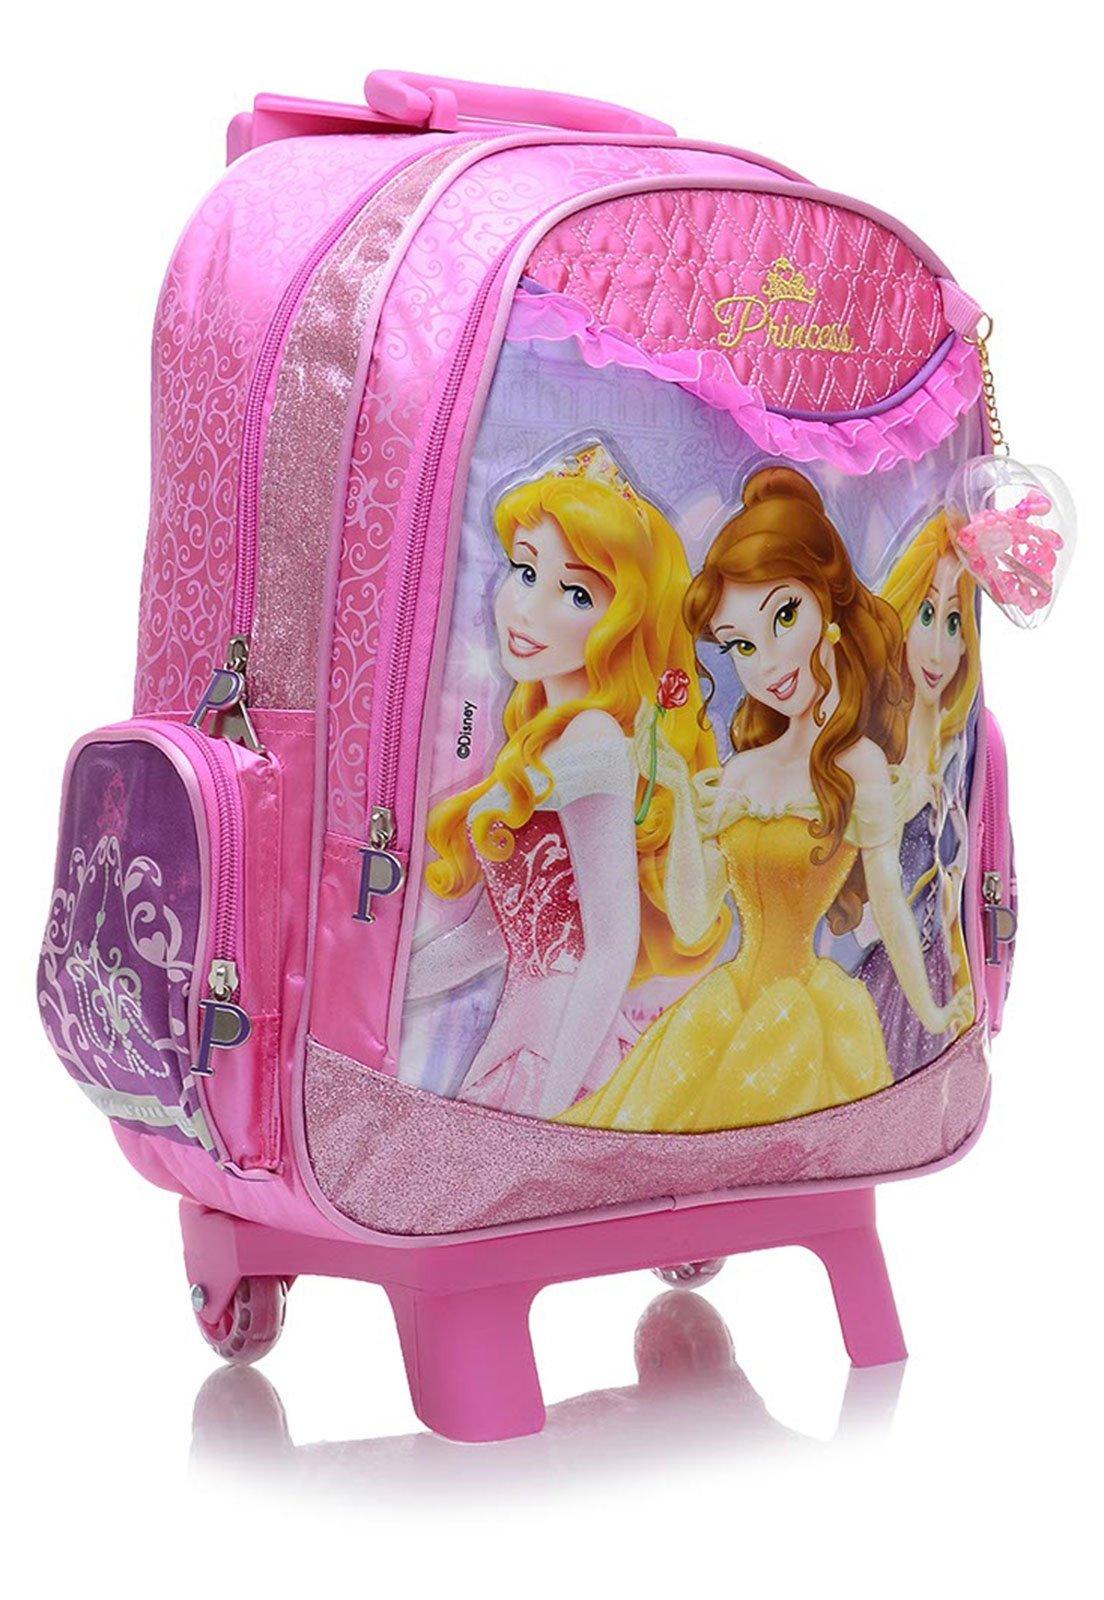 4c6cc5a0a Mochila de Rodinhas Infantil Dermiwil M Pink Princesas - Compre Agora |  Tricae Brasil